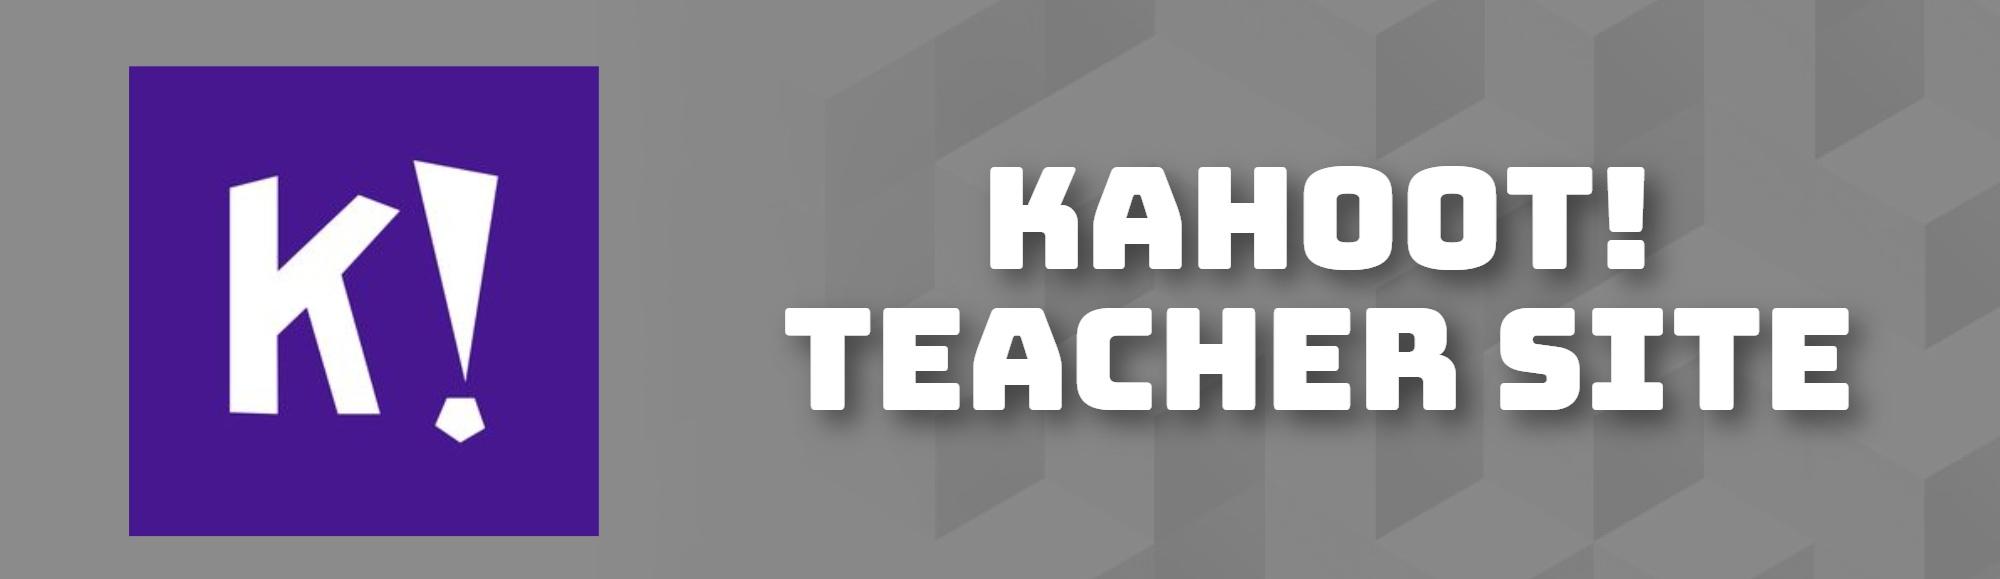 KAHOOT! Teacher Site